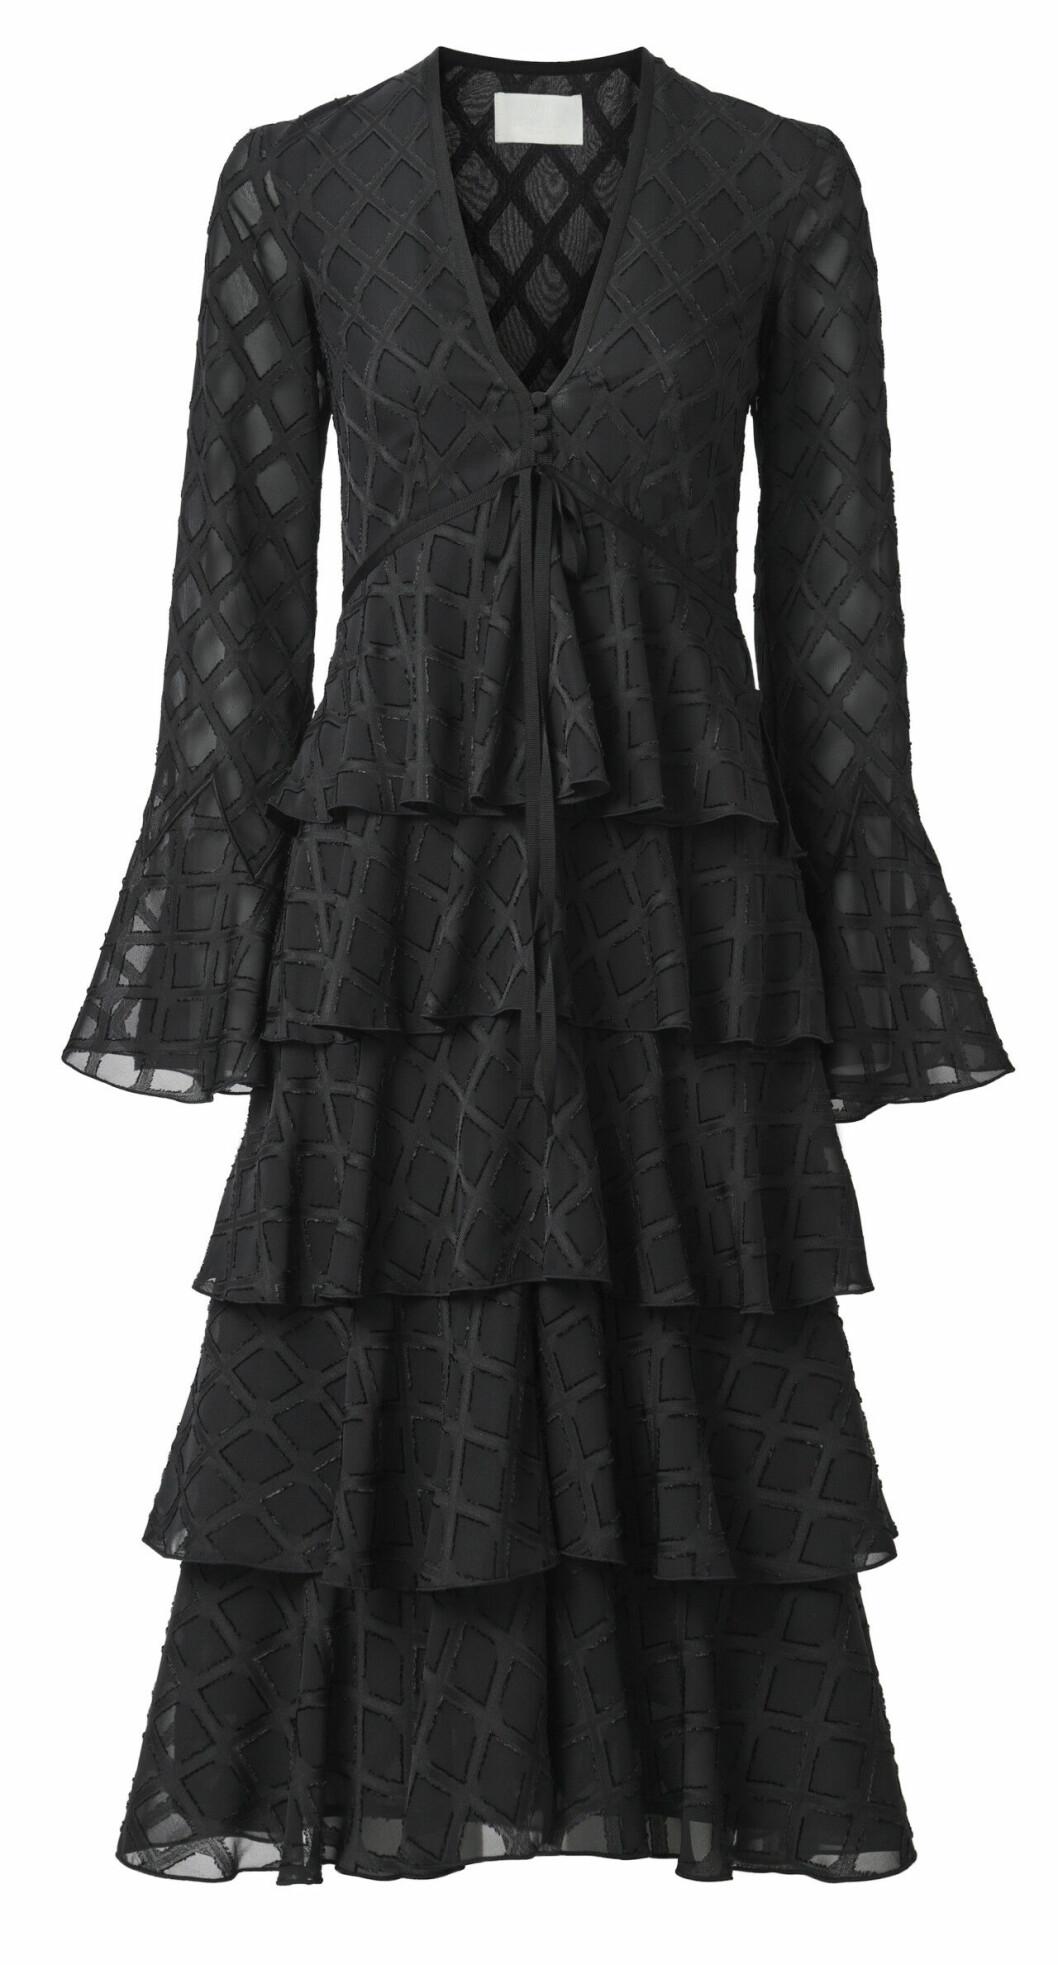 H&M Conscious Exclusive AW19 –svart klänning med volanger